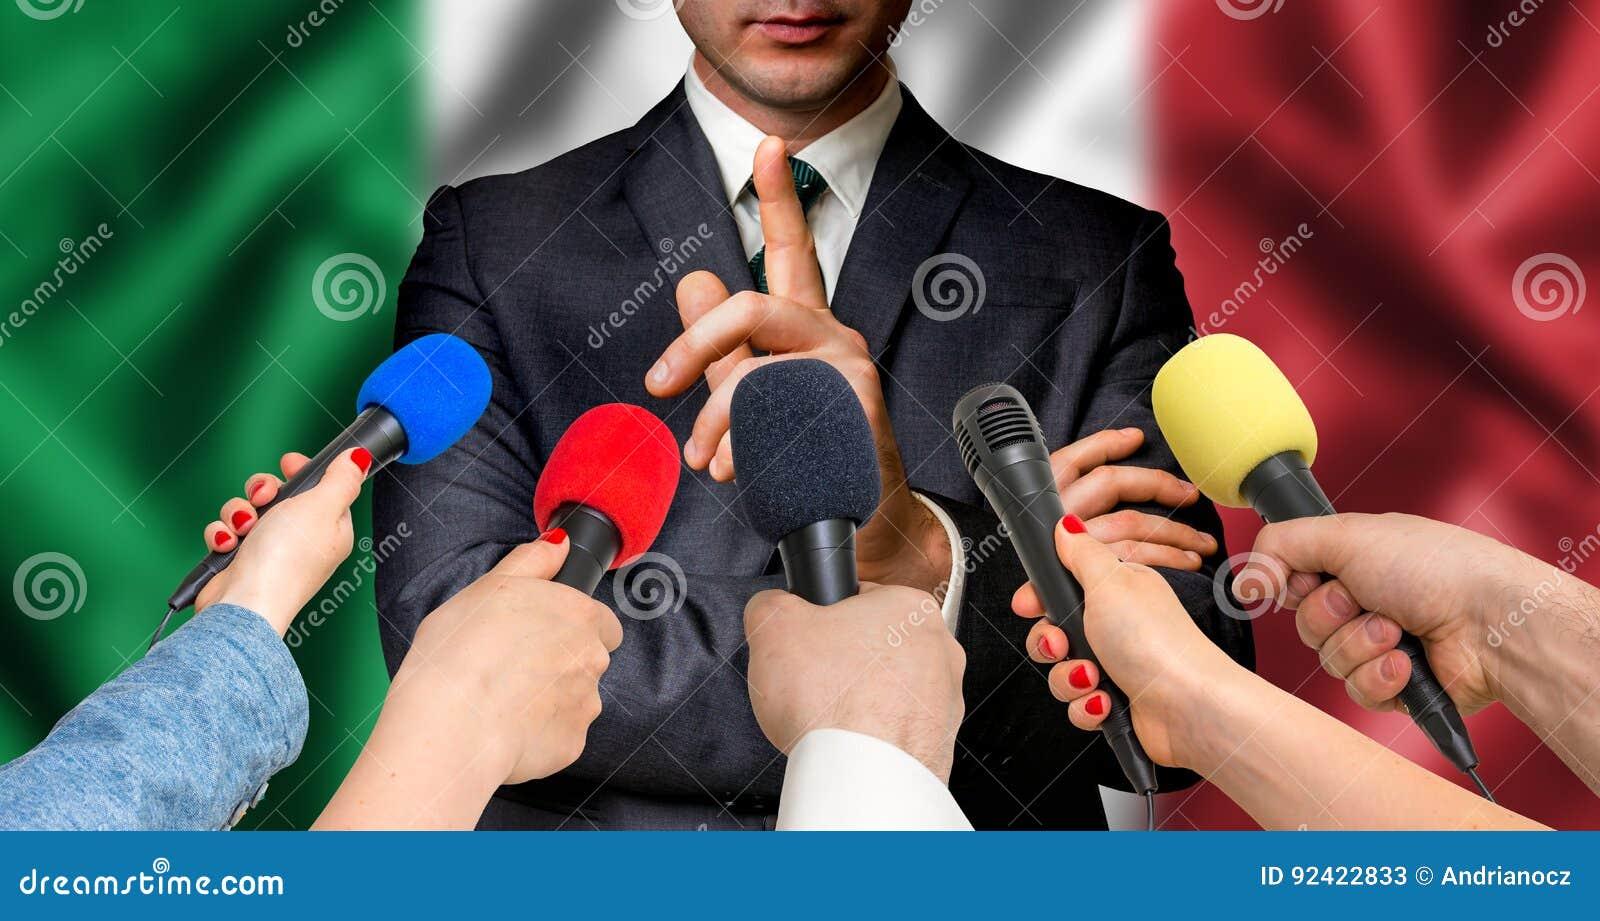 O candidato italiano fala aos repórteres - conceito do jornalismo